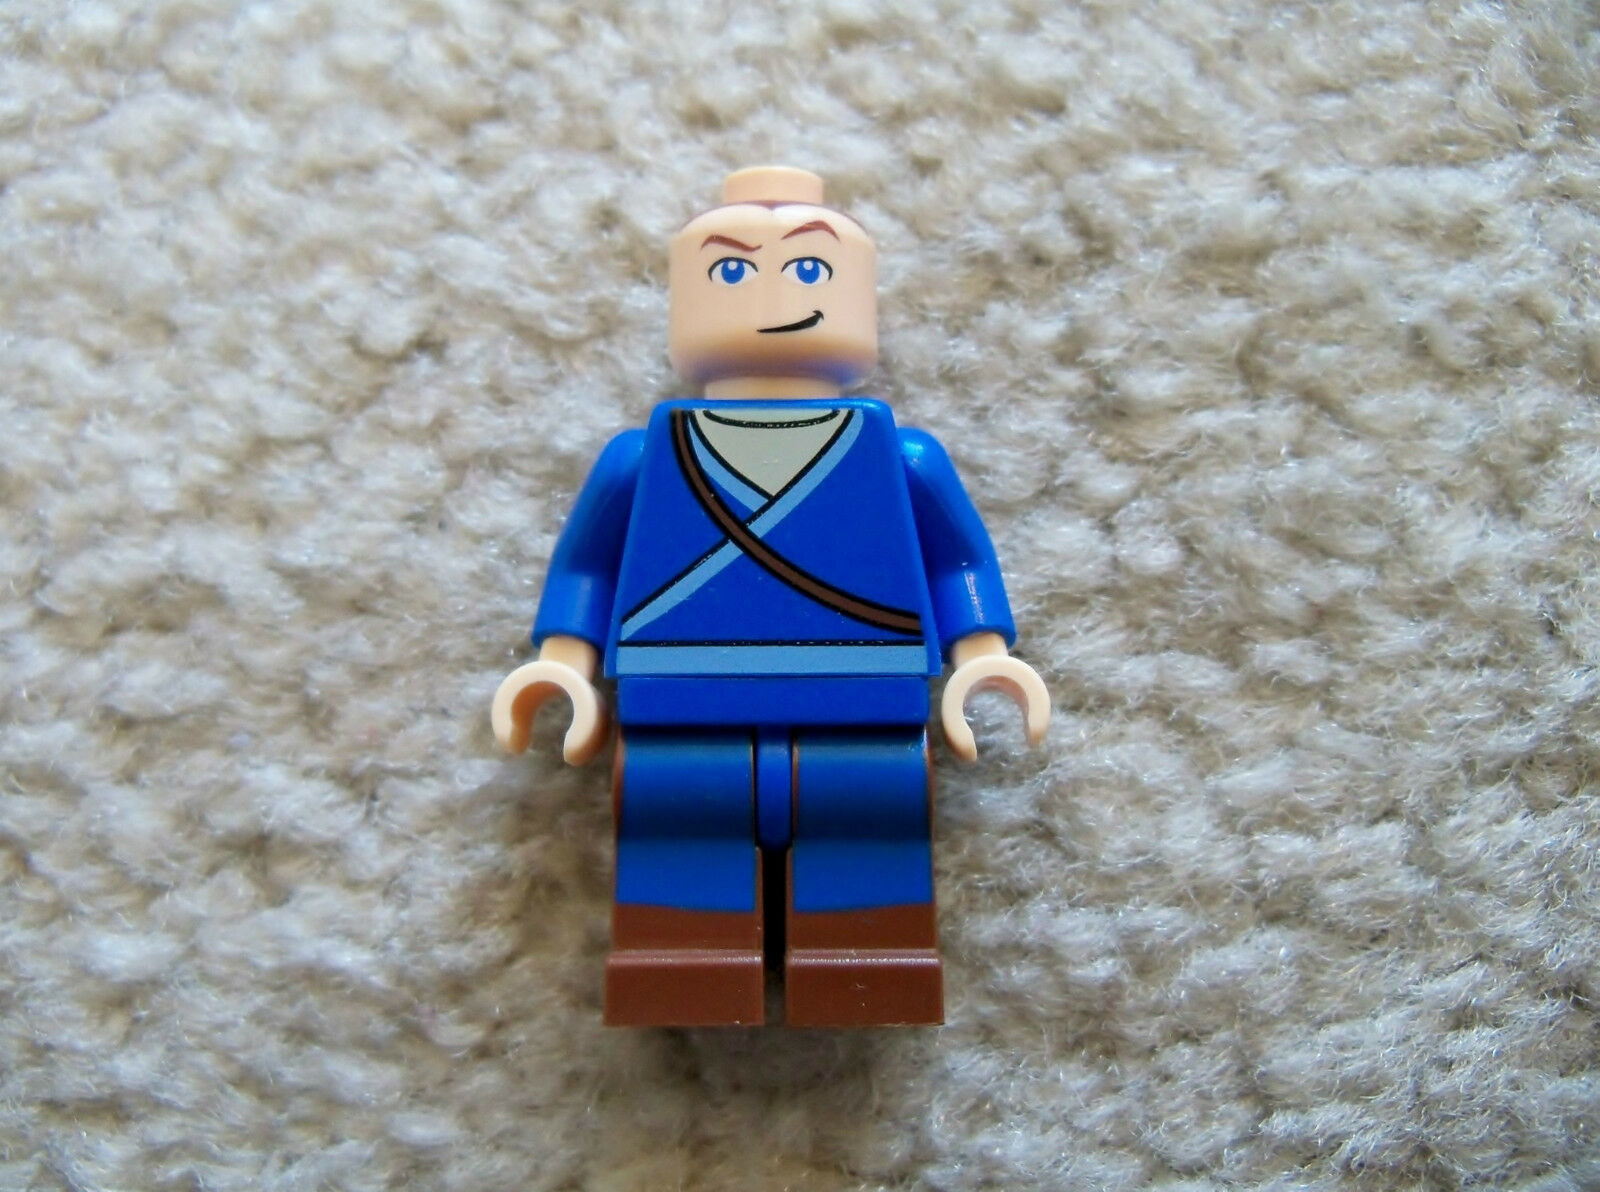 Monochrome BLUE Genuine Lego Minifigure RARE